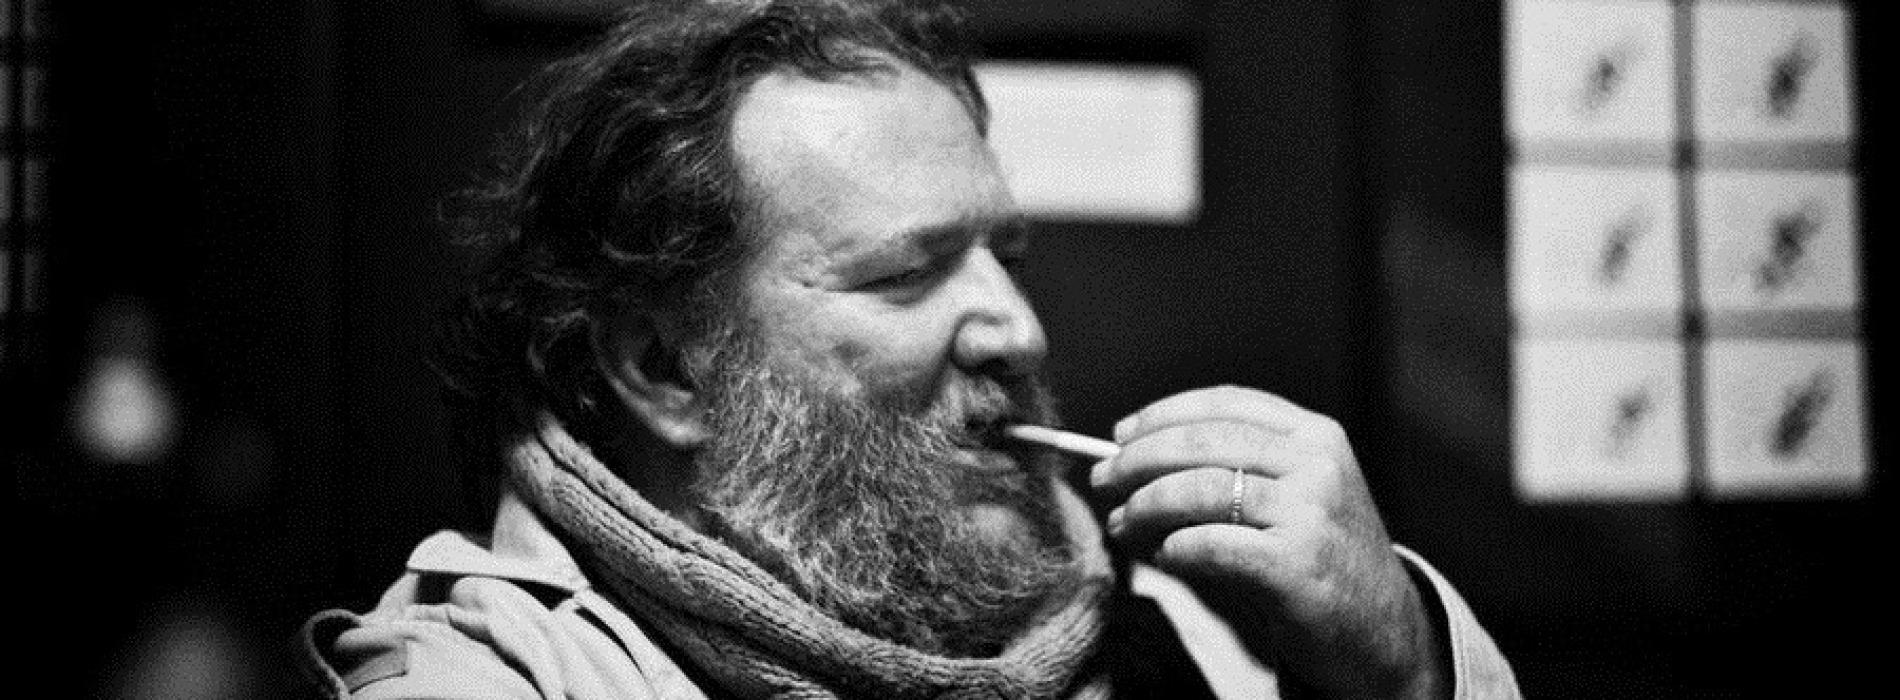 Versi e musica da Radio ZarZak, Bukowski incontra Tom Waits